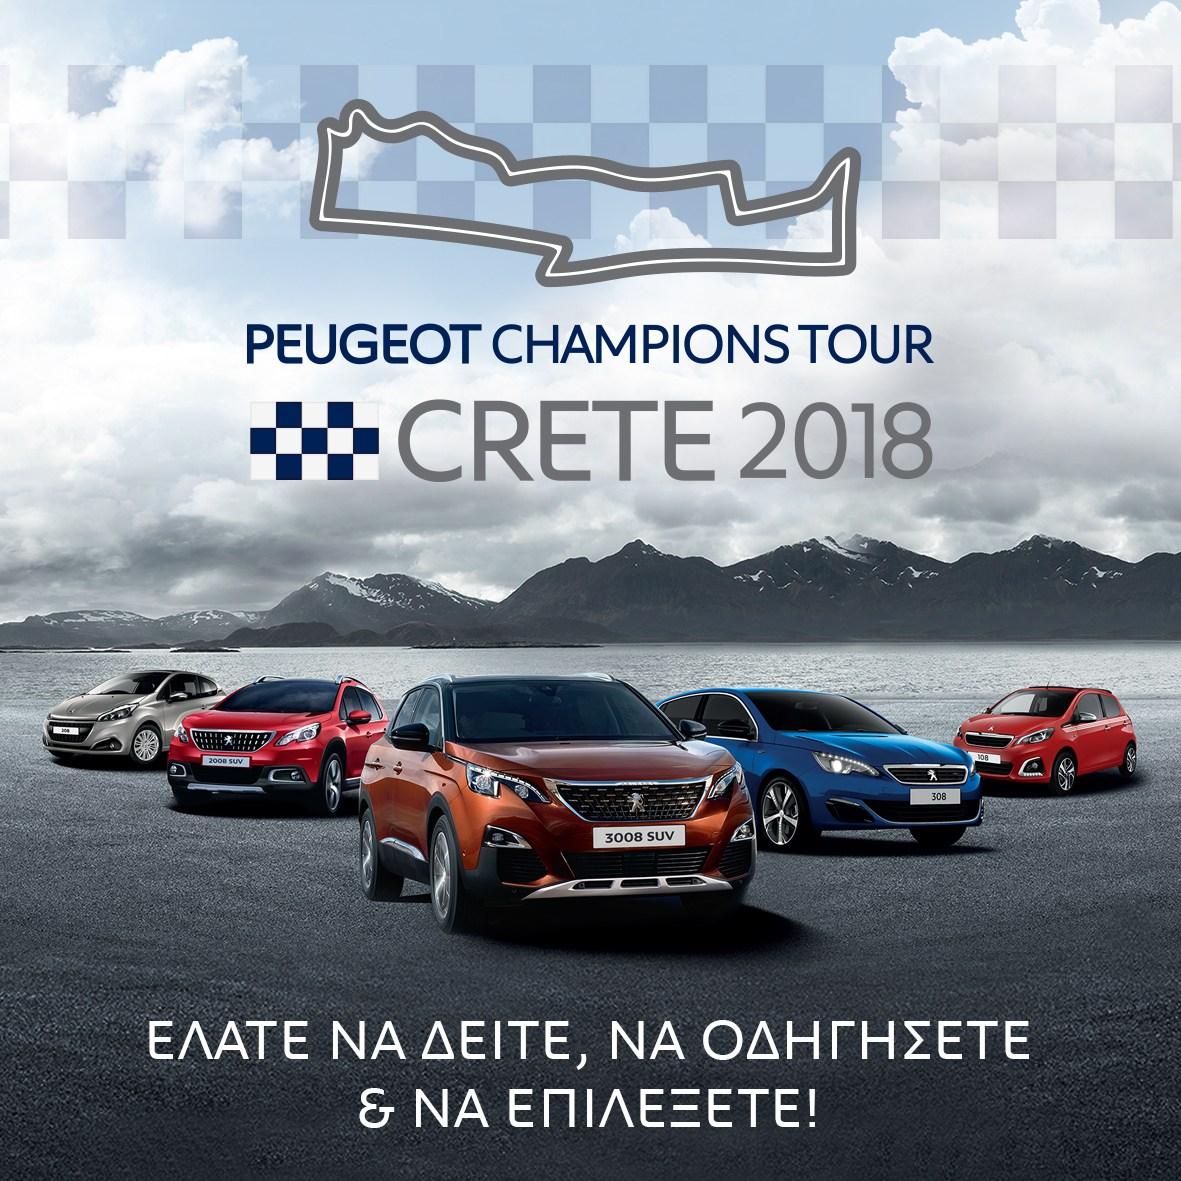 PEUGEOT CHAMPIONS TOUR: Οι πρωταθλητές της Peugeot πάνε στην ΚΡΗΤΗ!